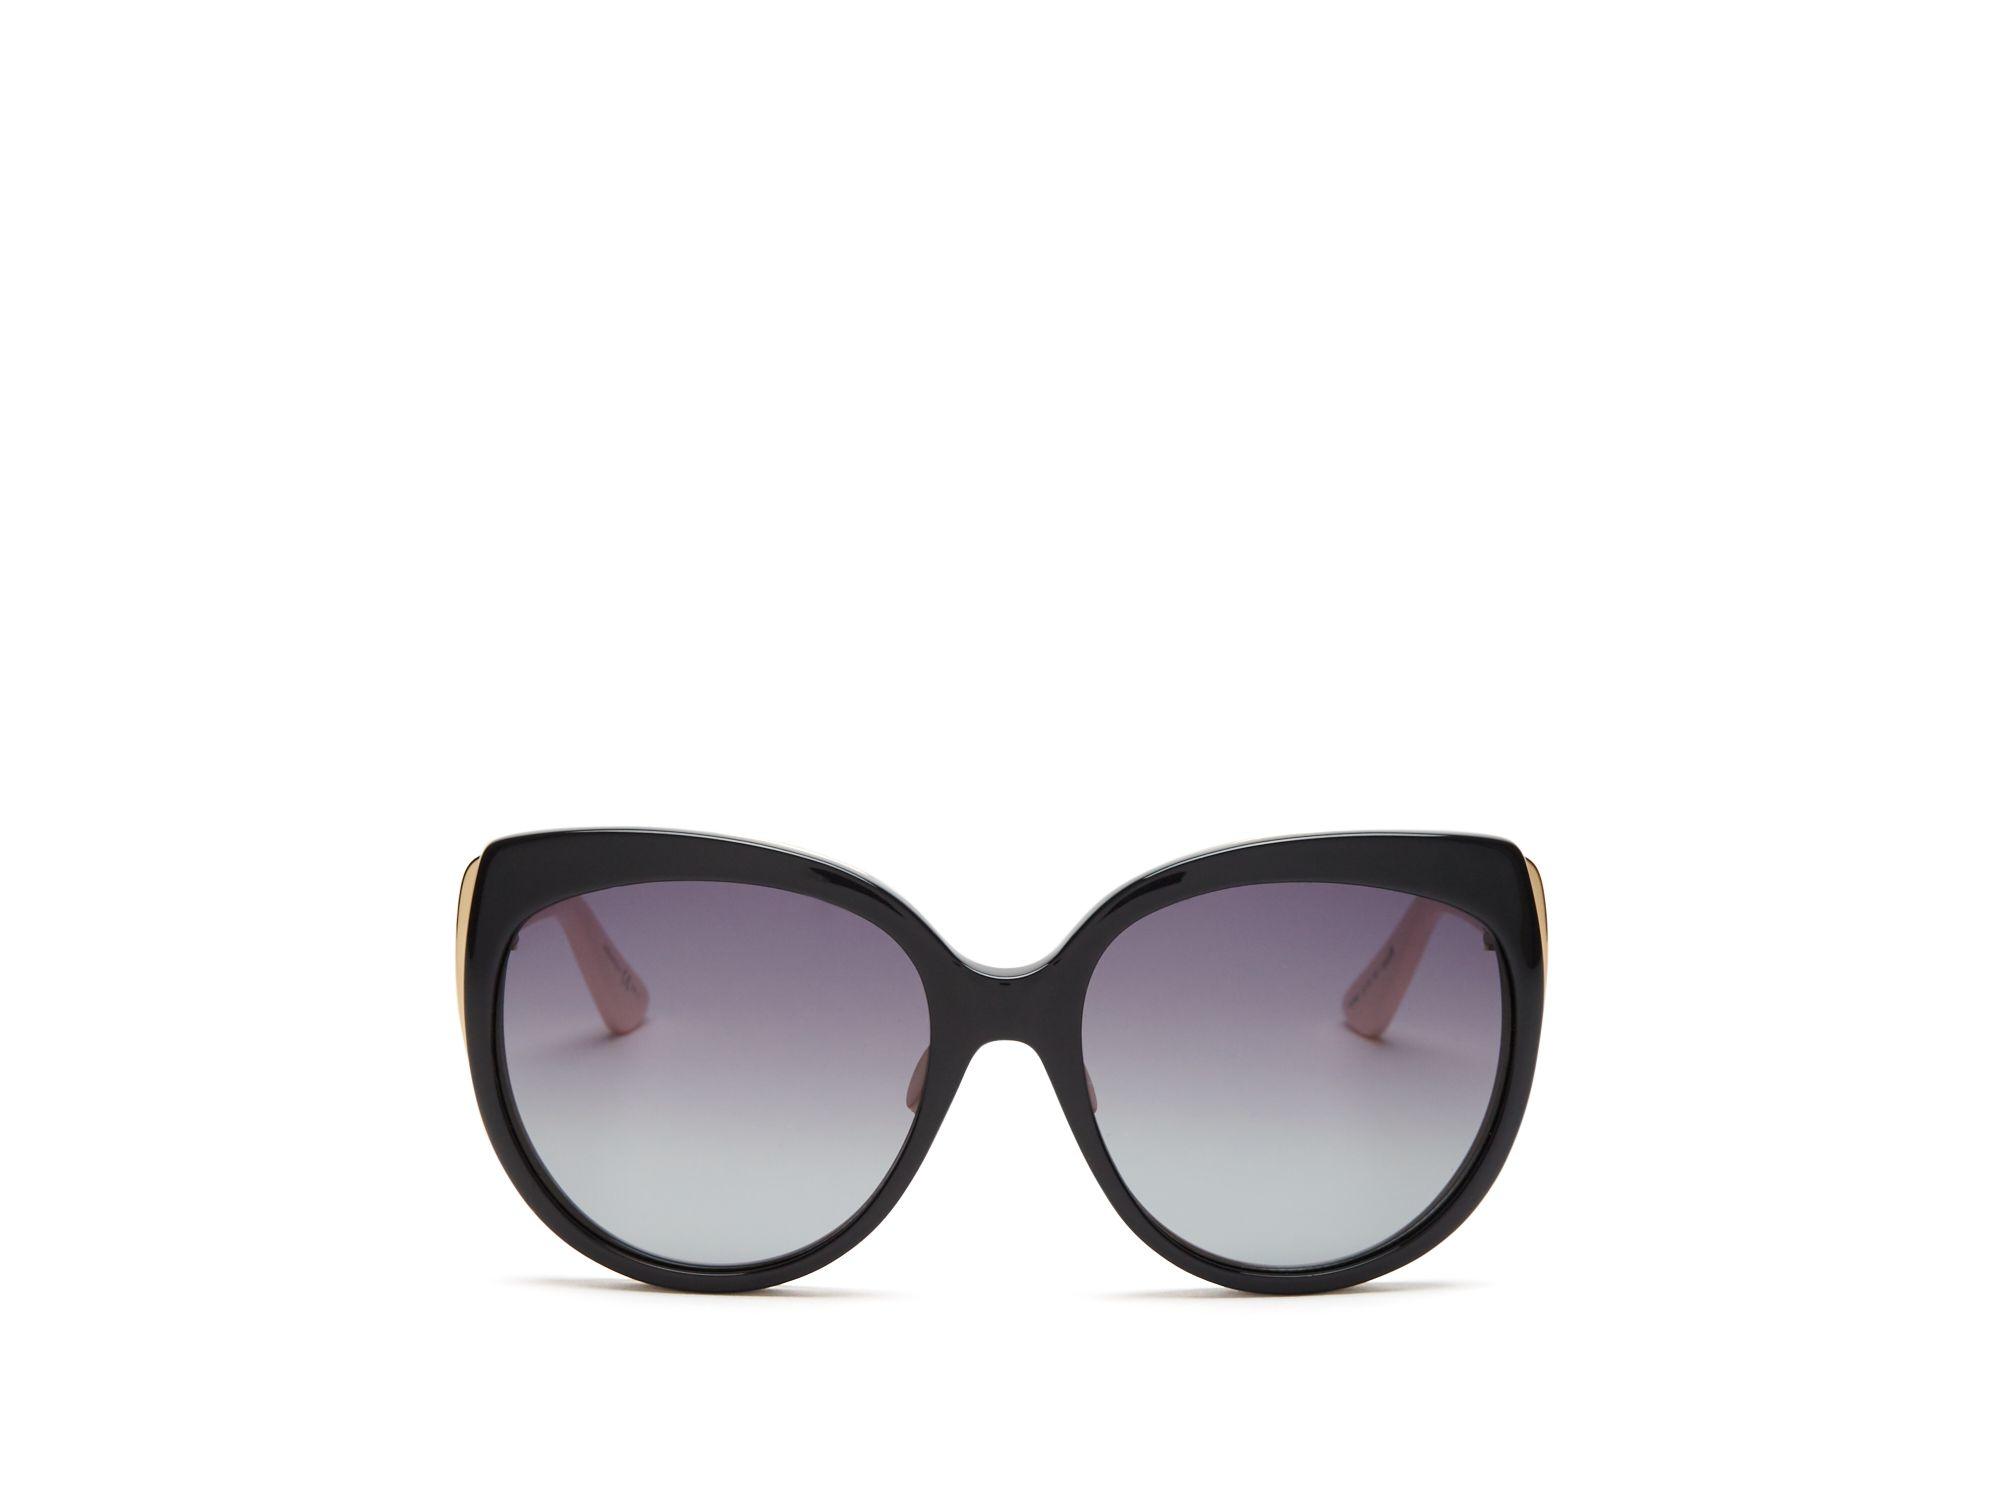 1d2abdcb30 Dior Sunglasses Cat Eye 2015